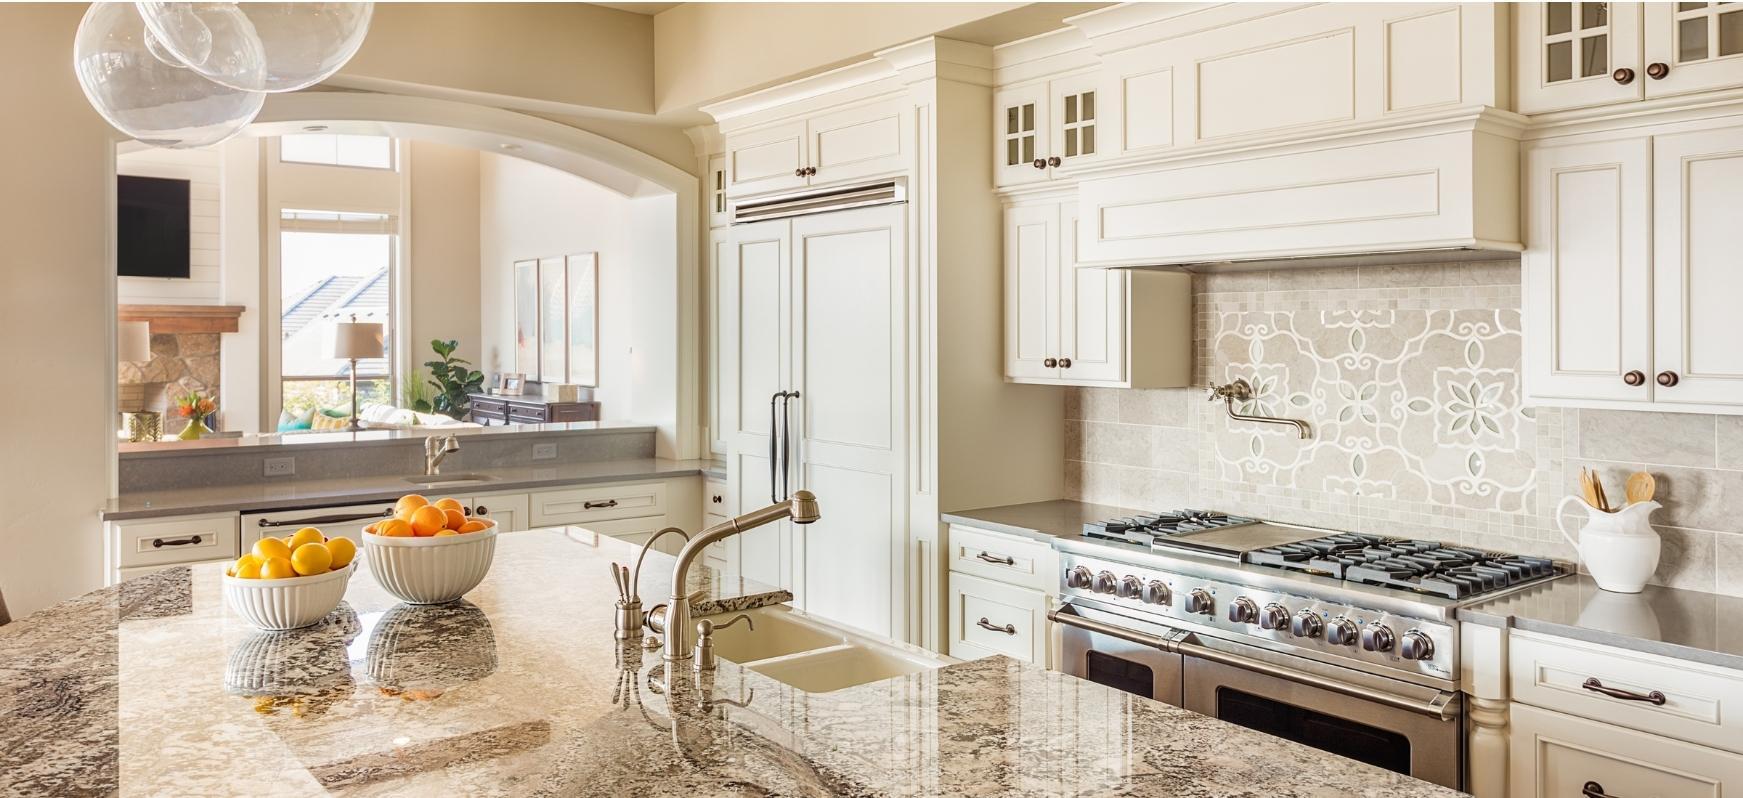 Rustic Farmhouse Style Granite Kitchen Countertops with Decorative Backsplash Tile Natural Stone Countertops